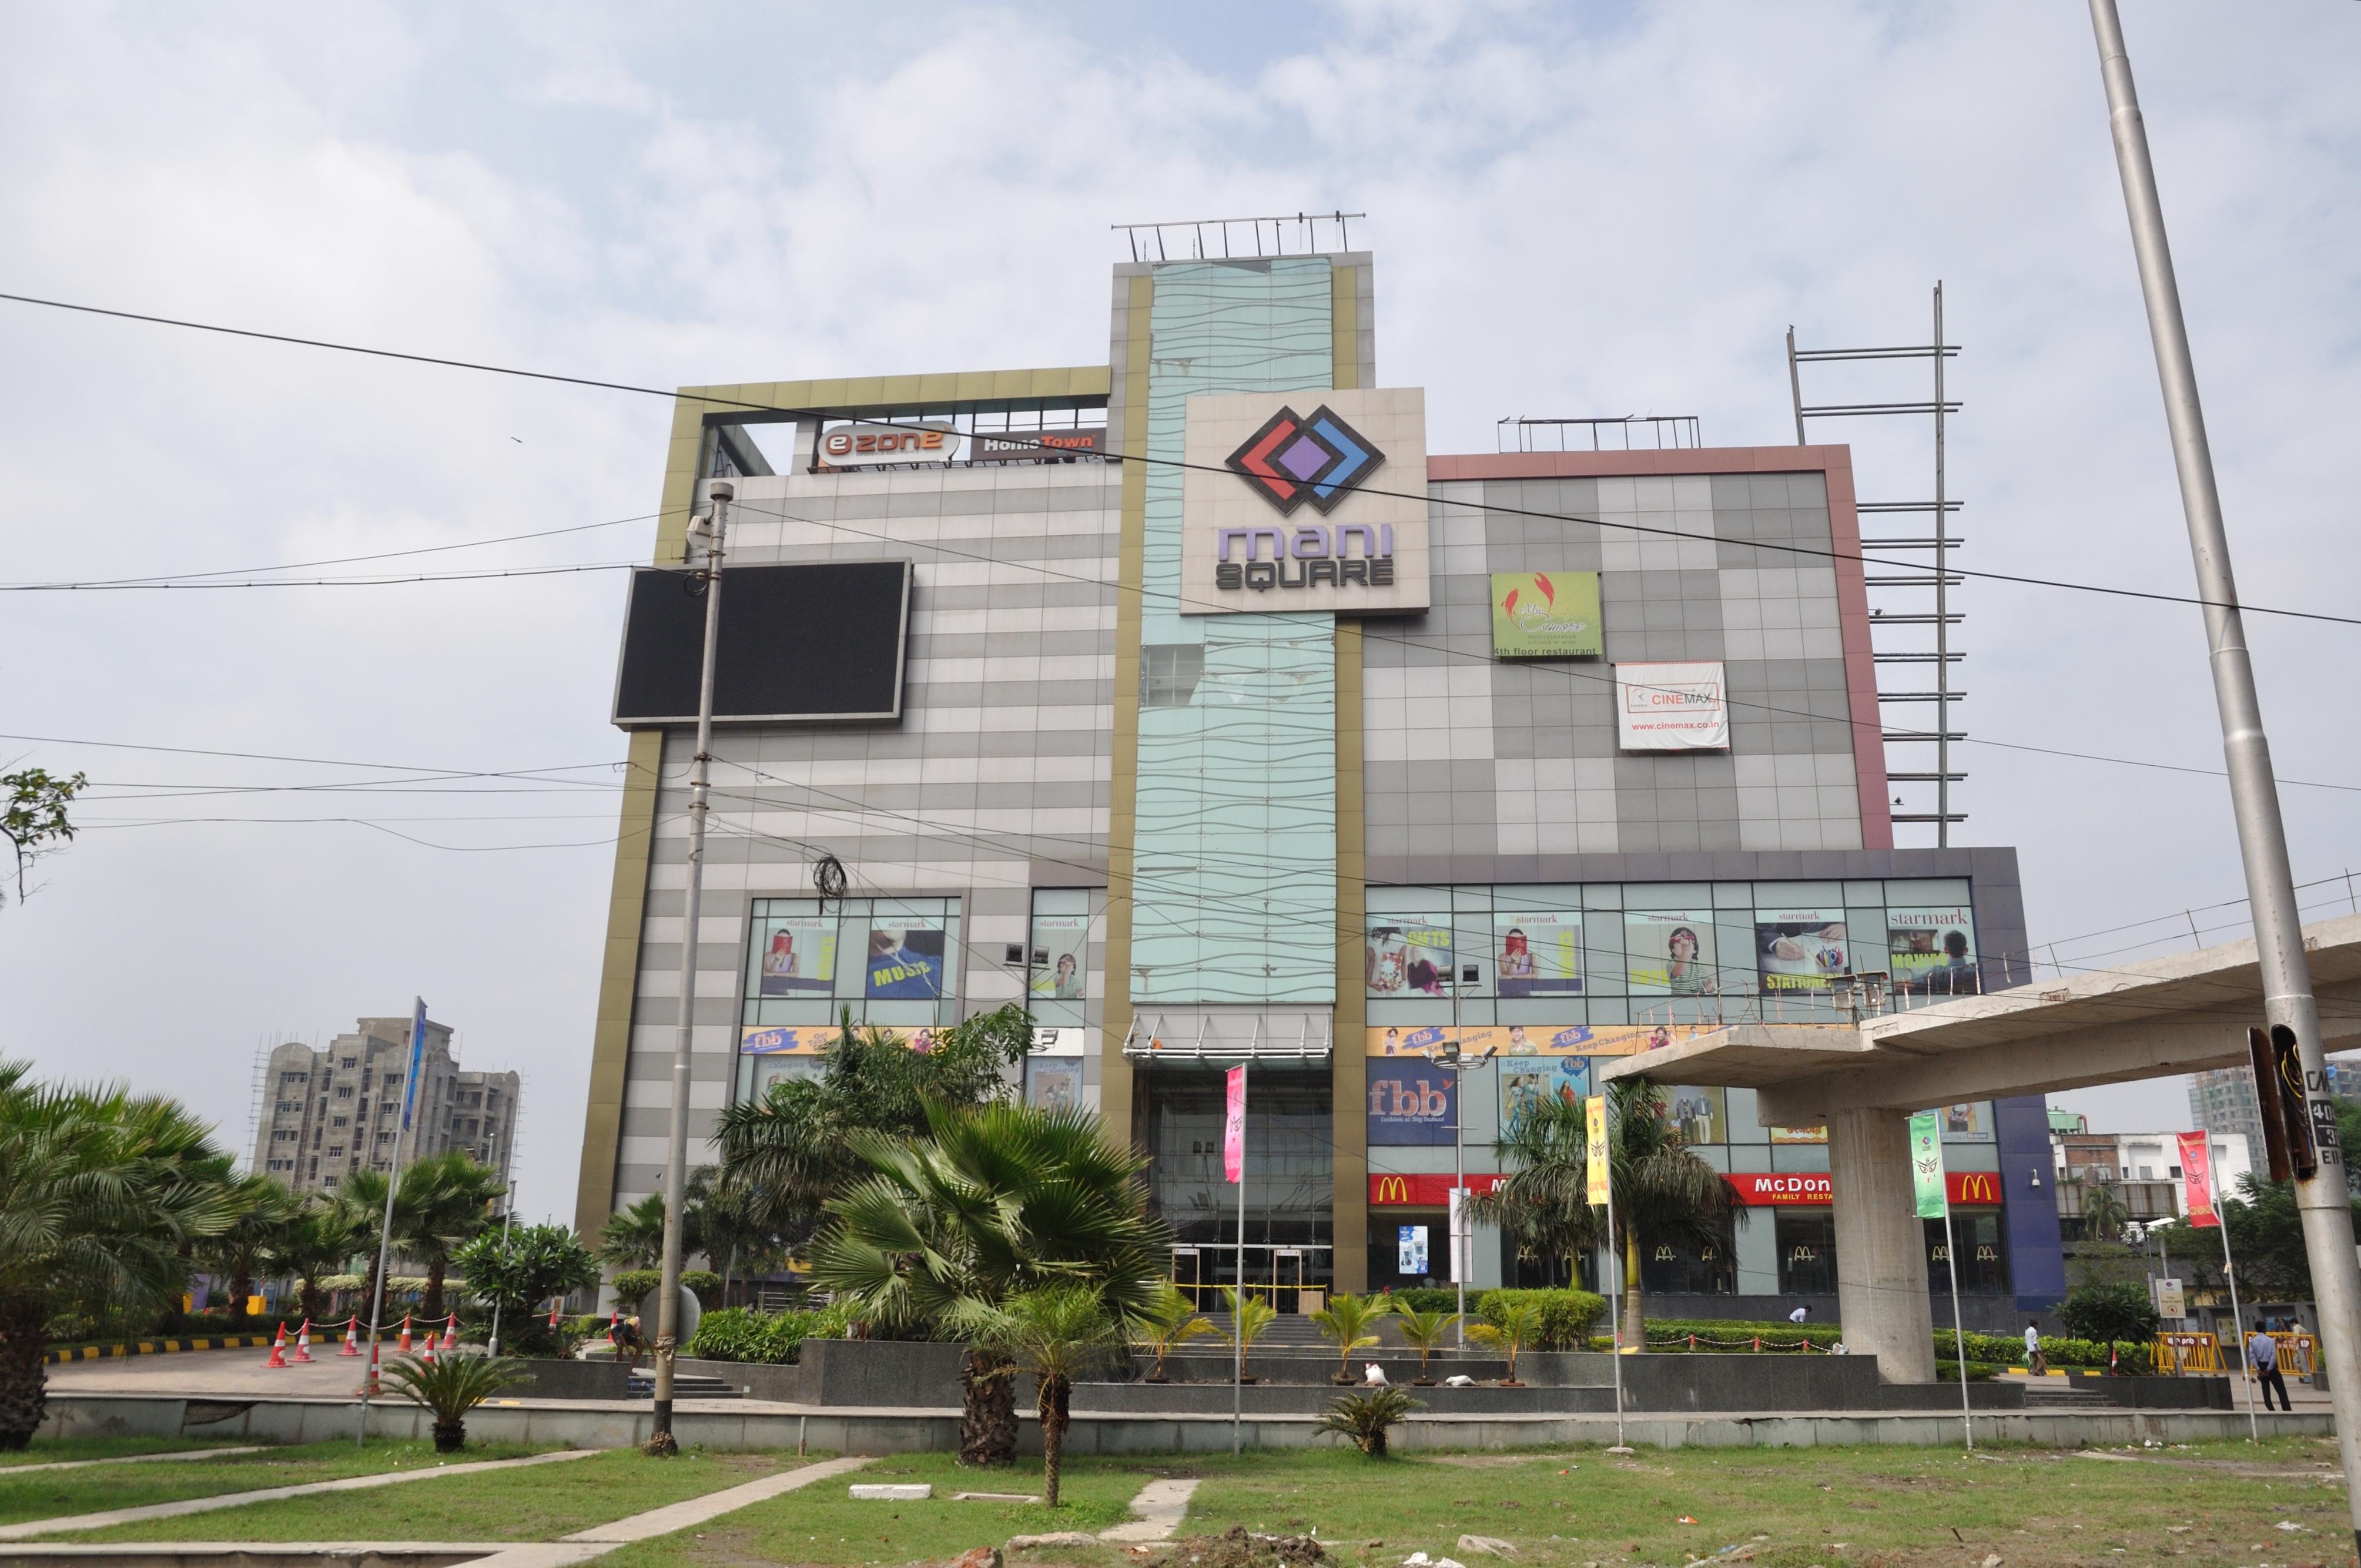 Mall clipart shopping plaza. Mani square wikipedia